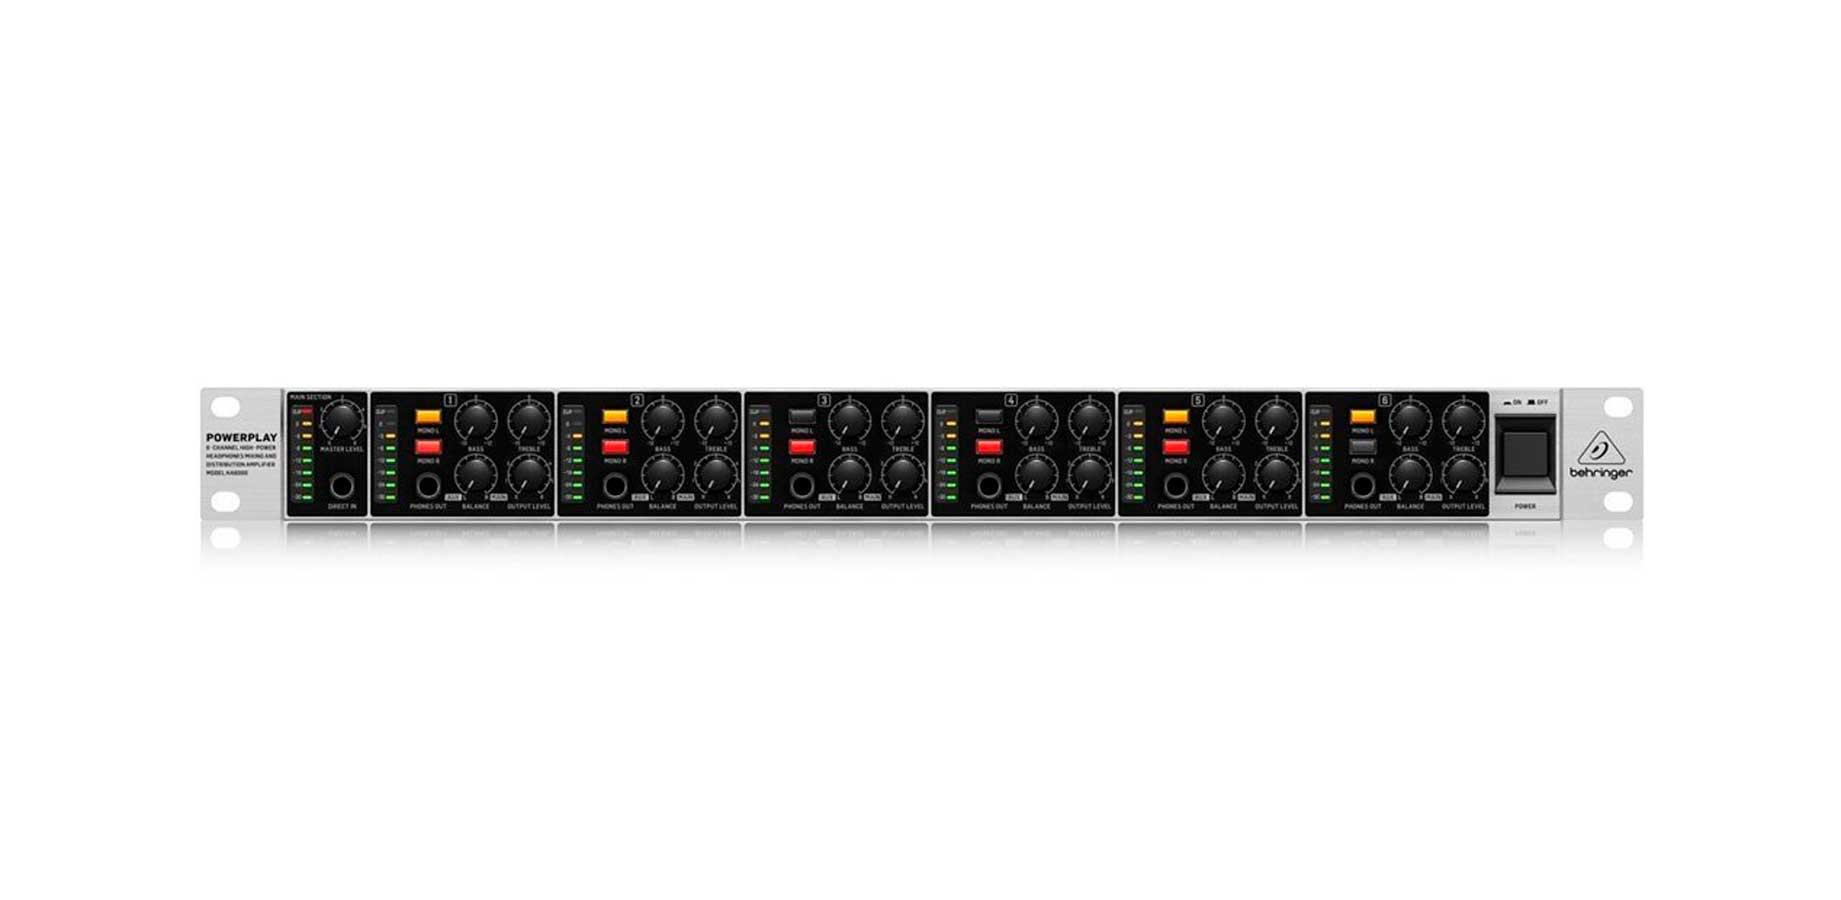 Kit 6 Fones AKG K414P + 1 Amplificador Behringer HA6000